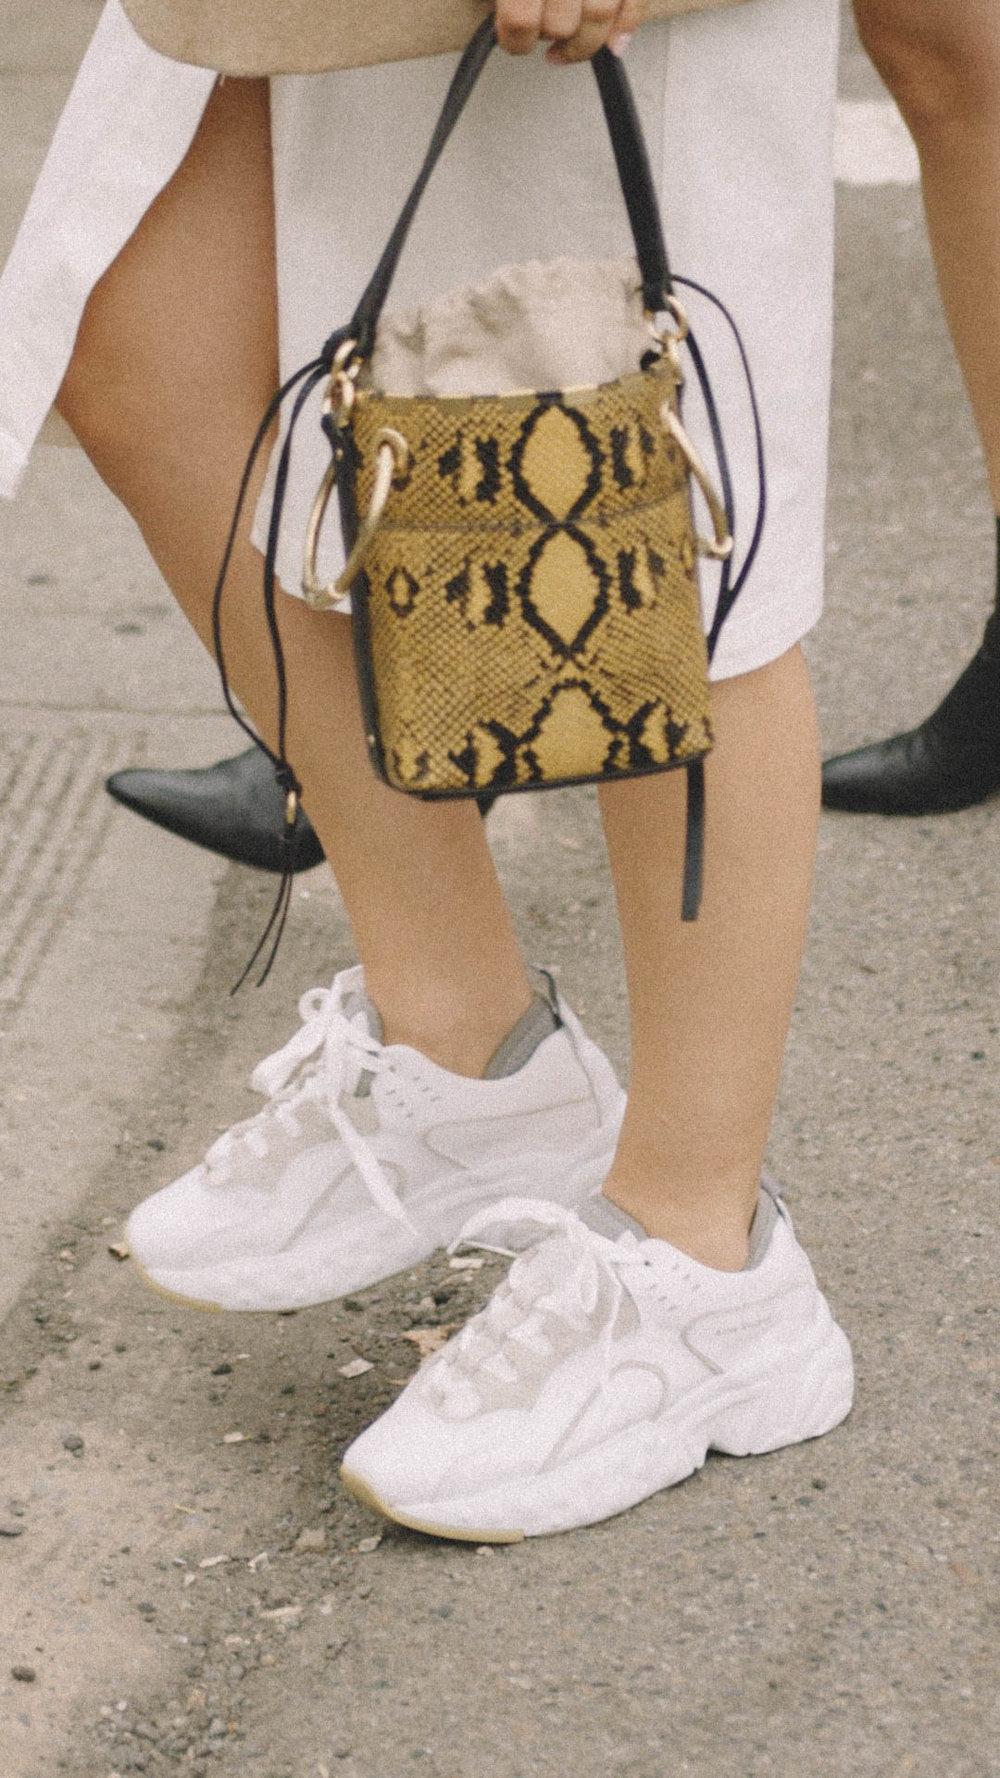 12 Best Chloe bags of Fashion Week -  CHLOe Roy mini leather bucket bag and Chloe Small Tess Leather Shoulder Bag1.jpg